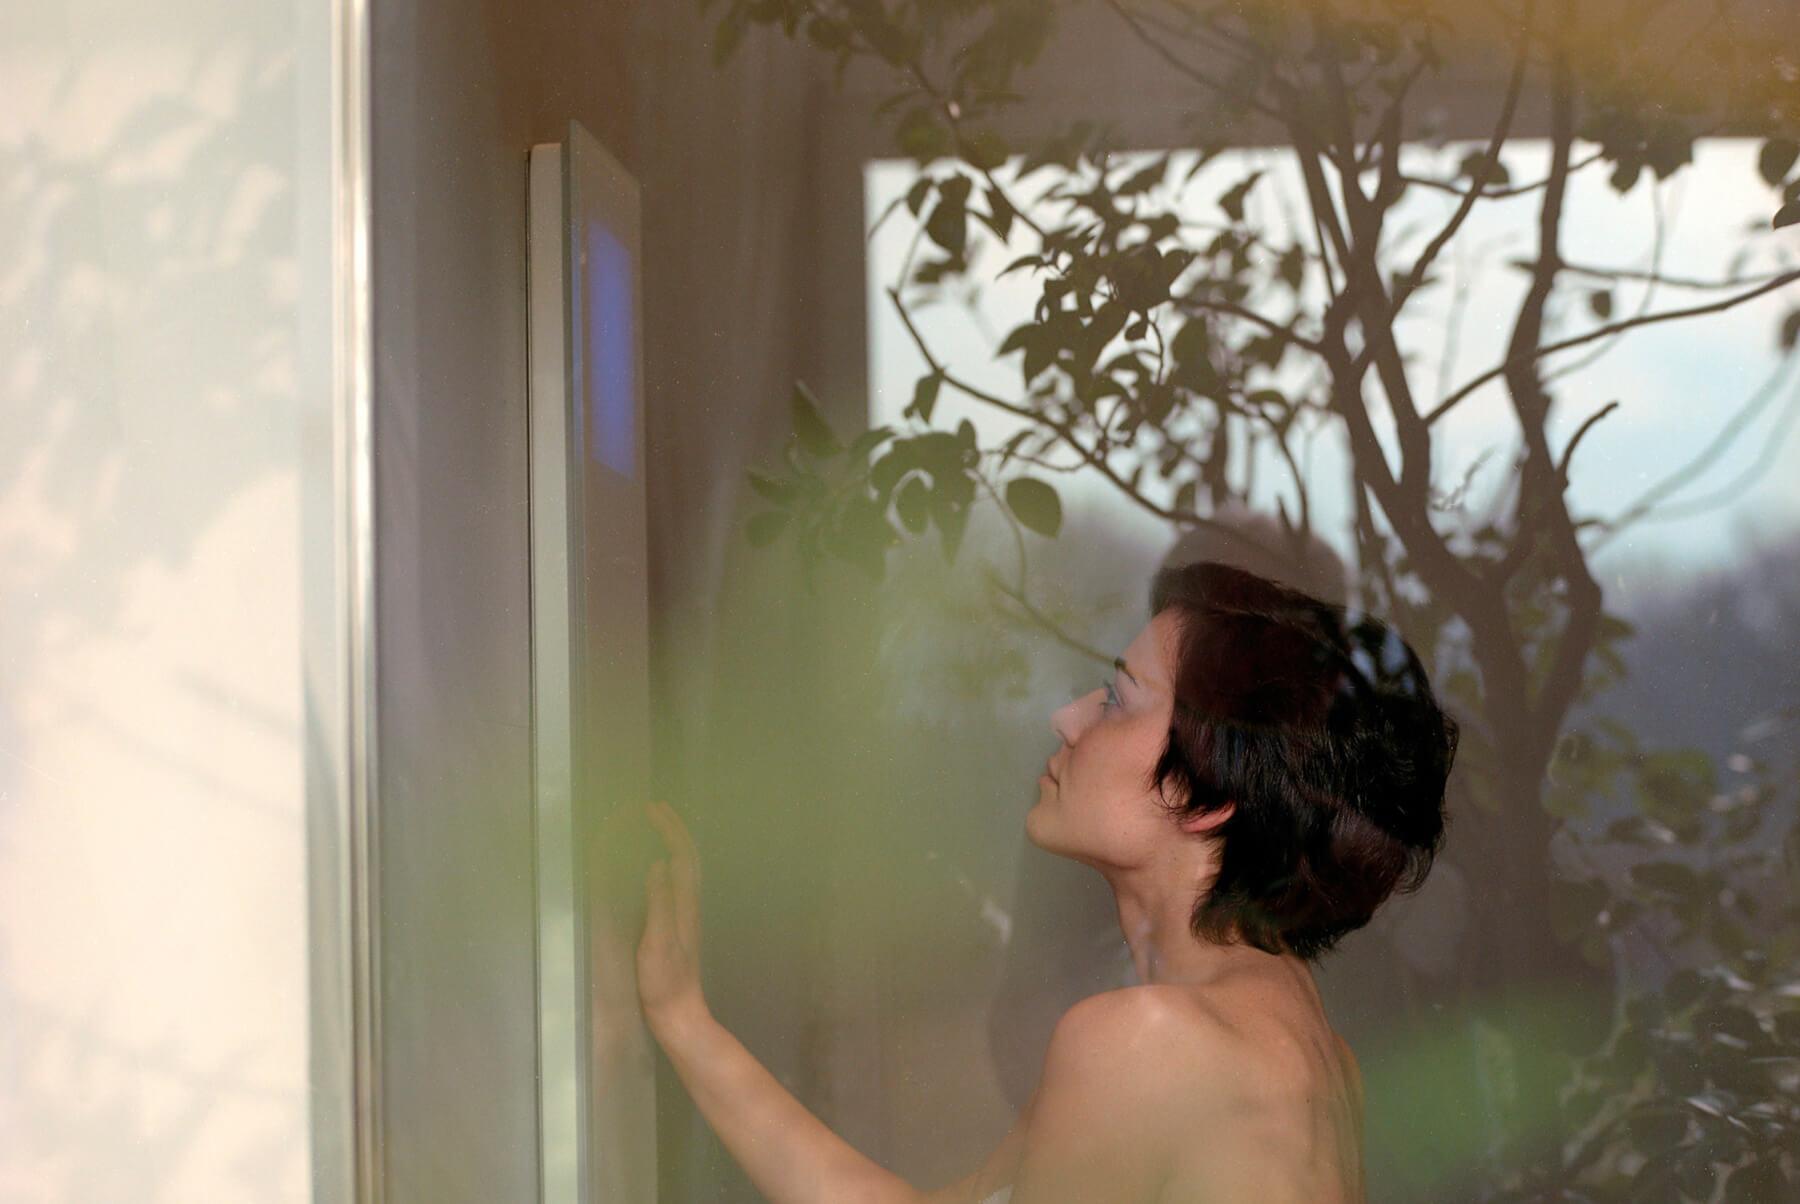 WELLNESS-Effegibi-touch-and-steam-inset-3-1800x1204